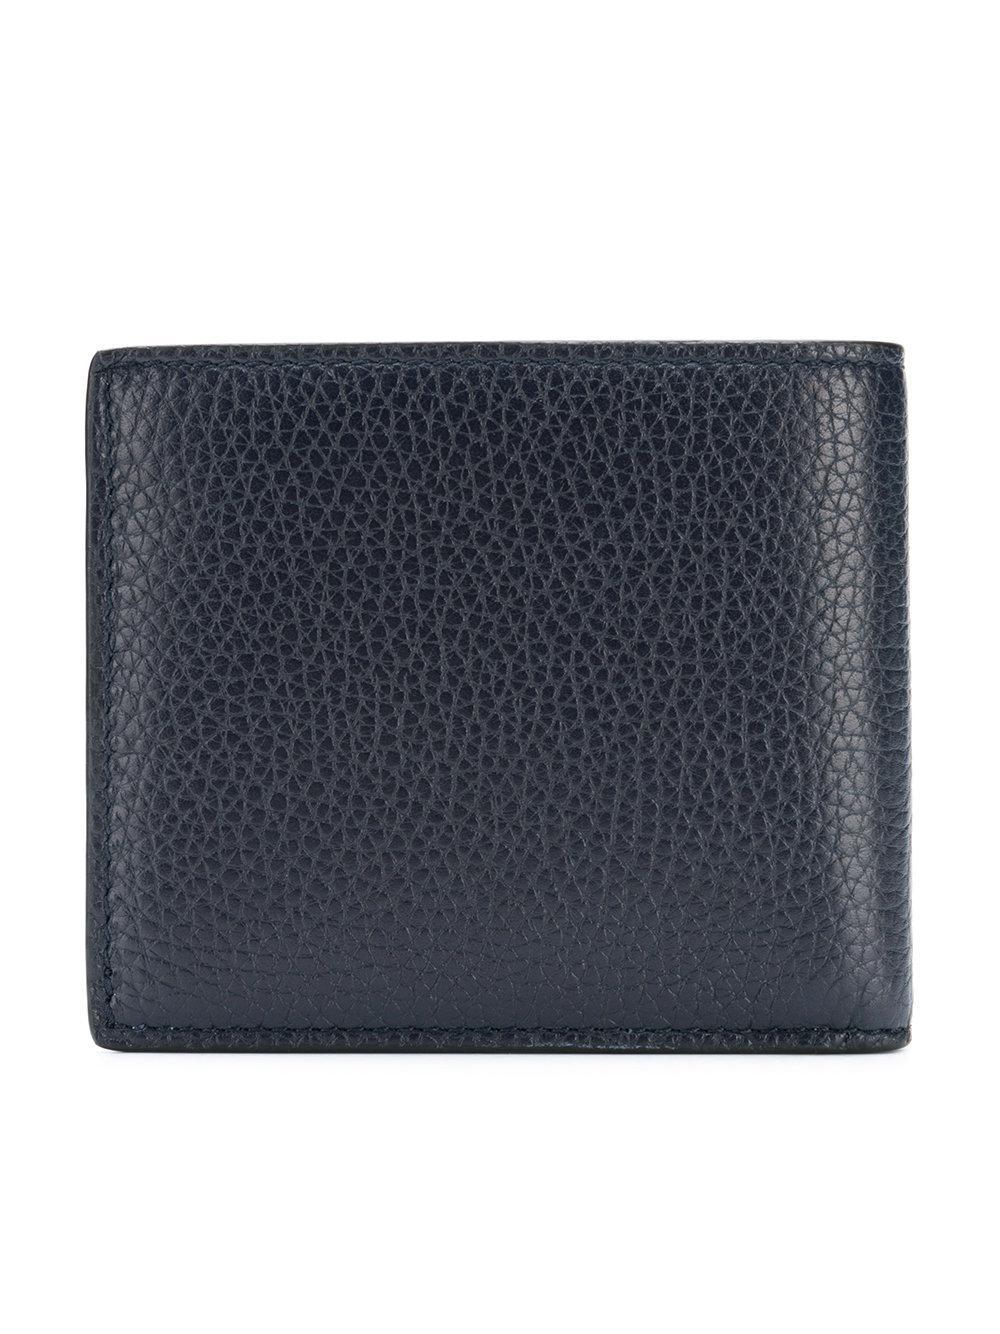 ca310fa0027 Lyst - Gucci Billfold Wallet in Blue for Men